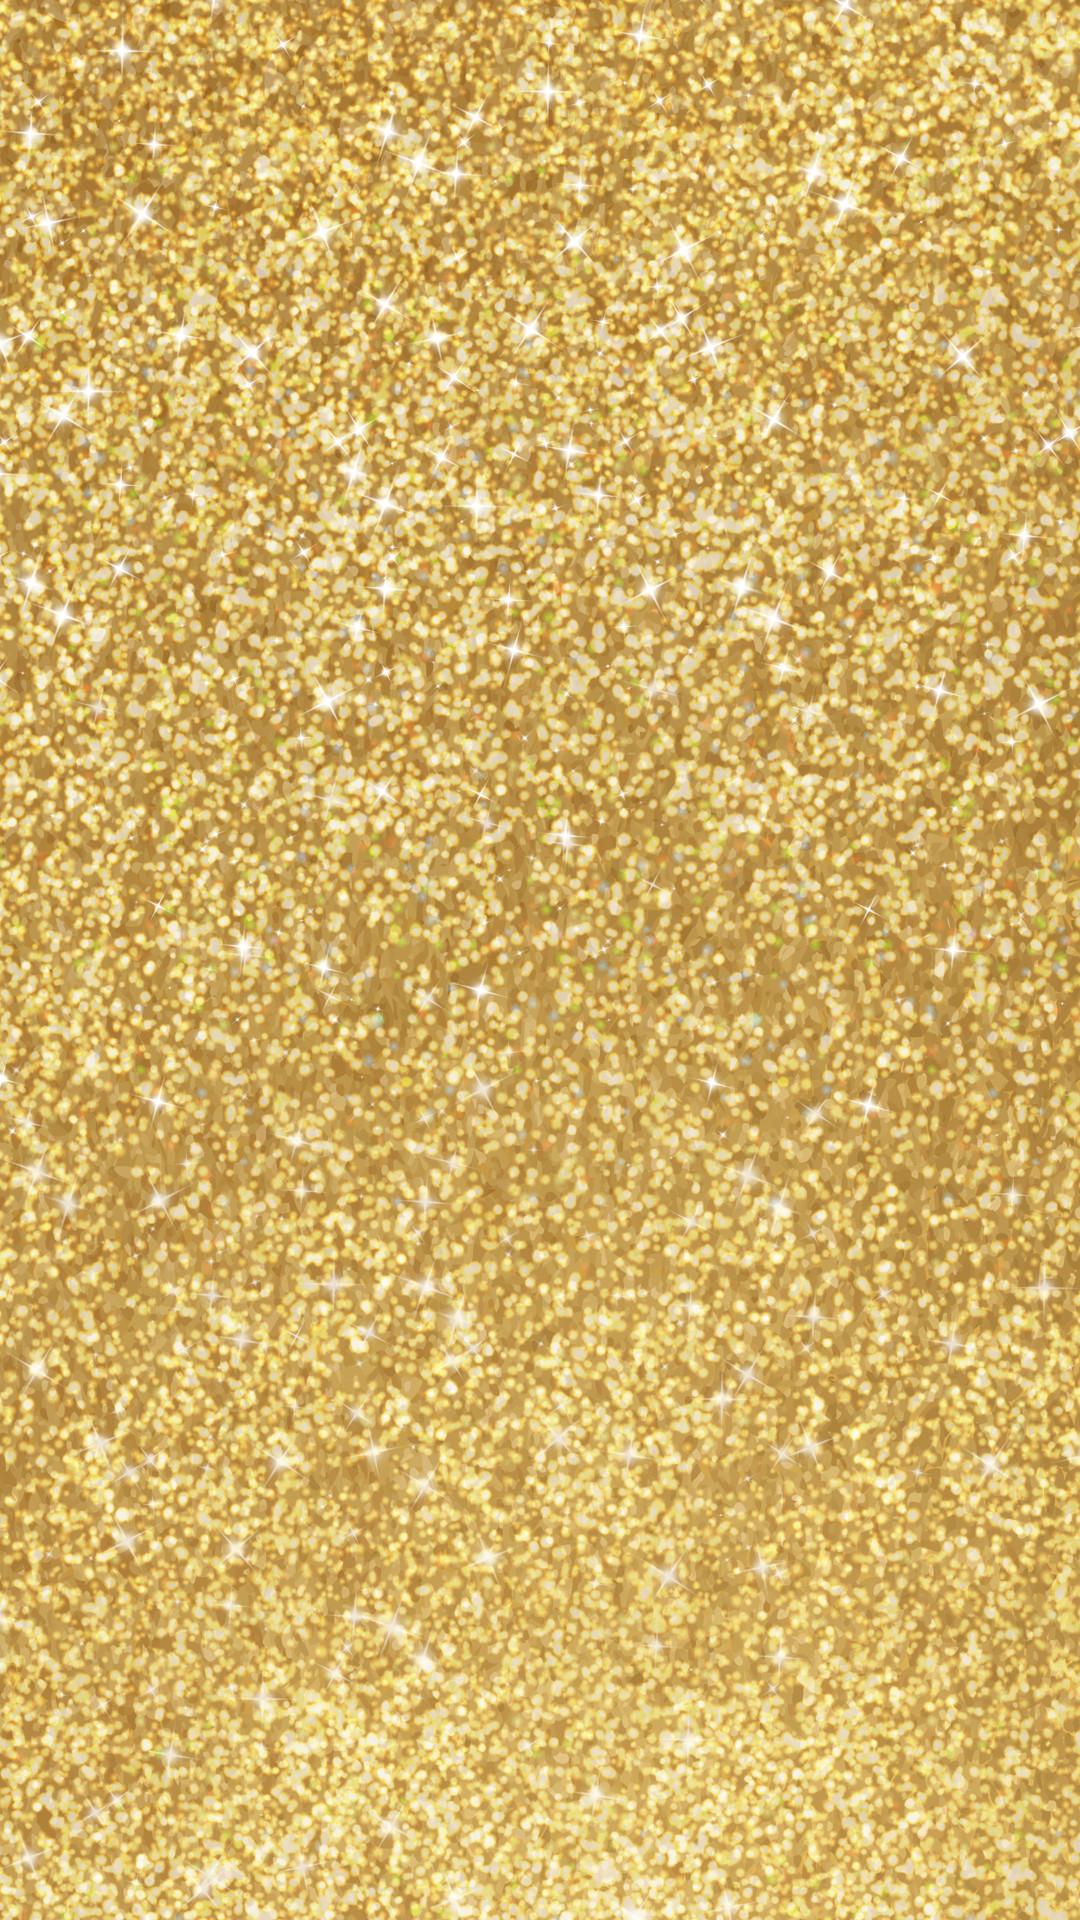 Res: 1080x1920, Gold Glitter Phone Wallpaper